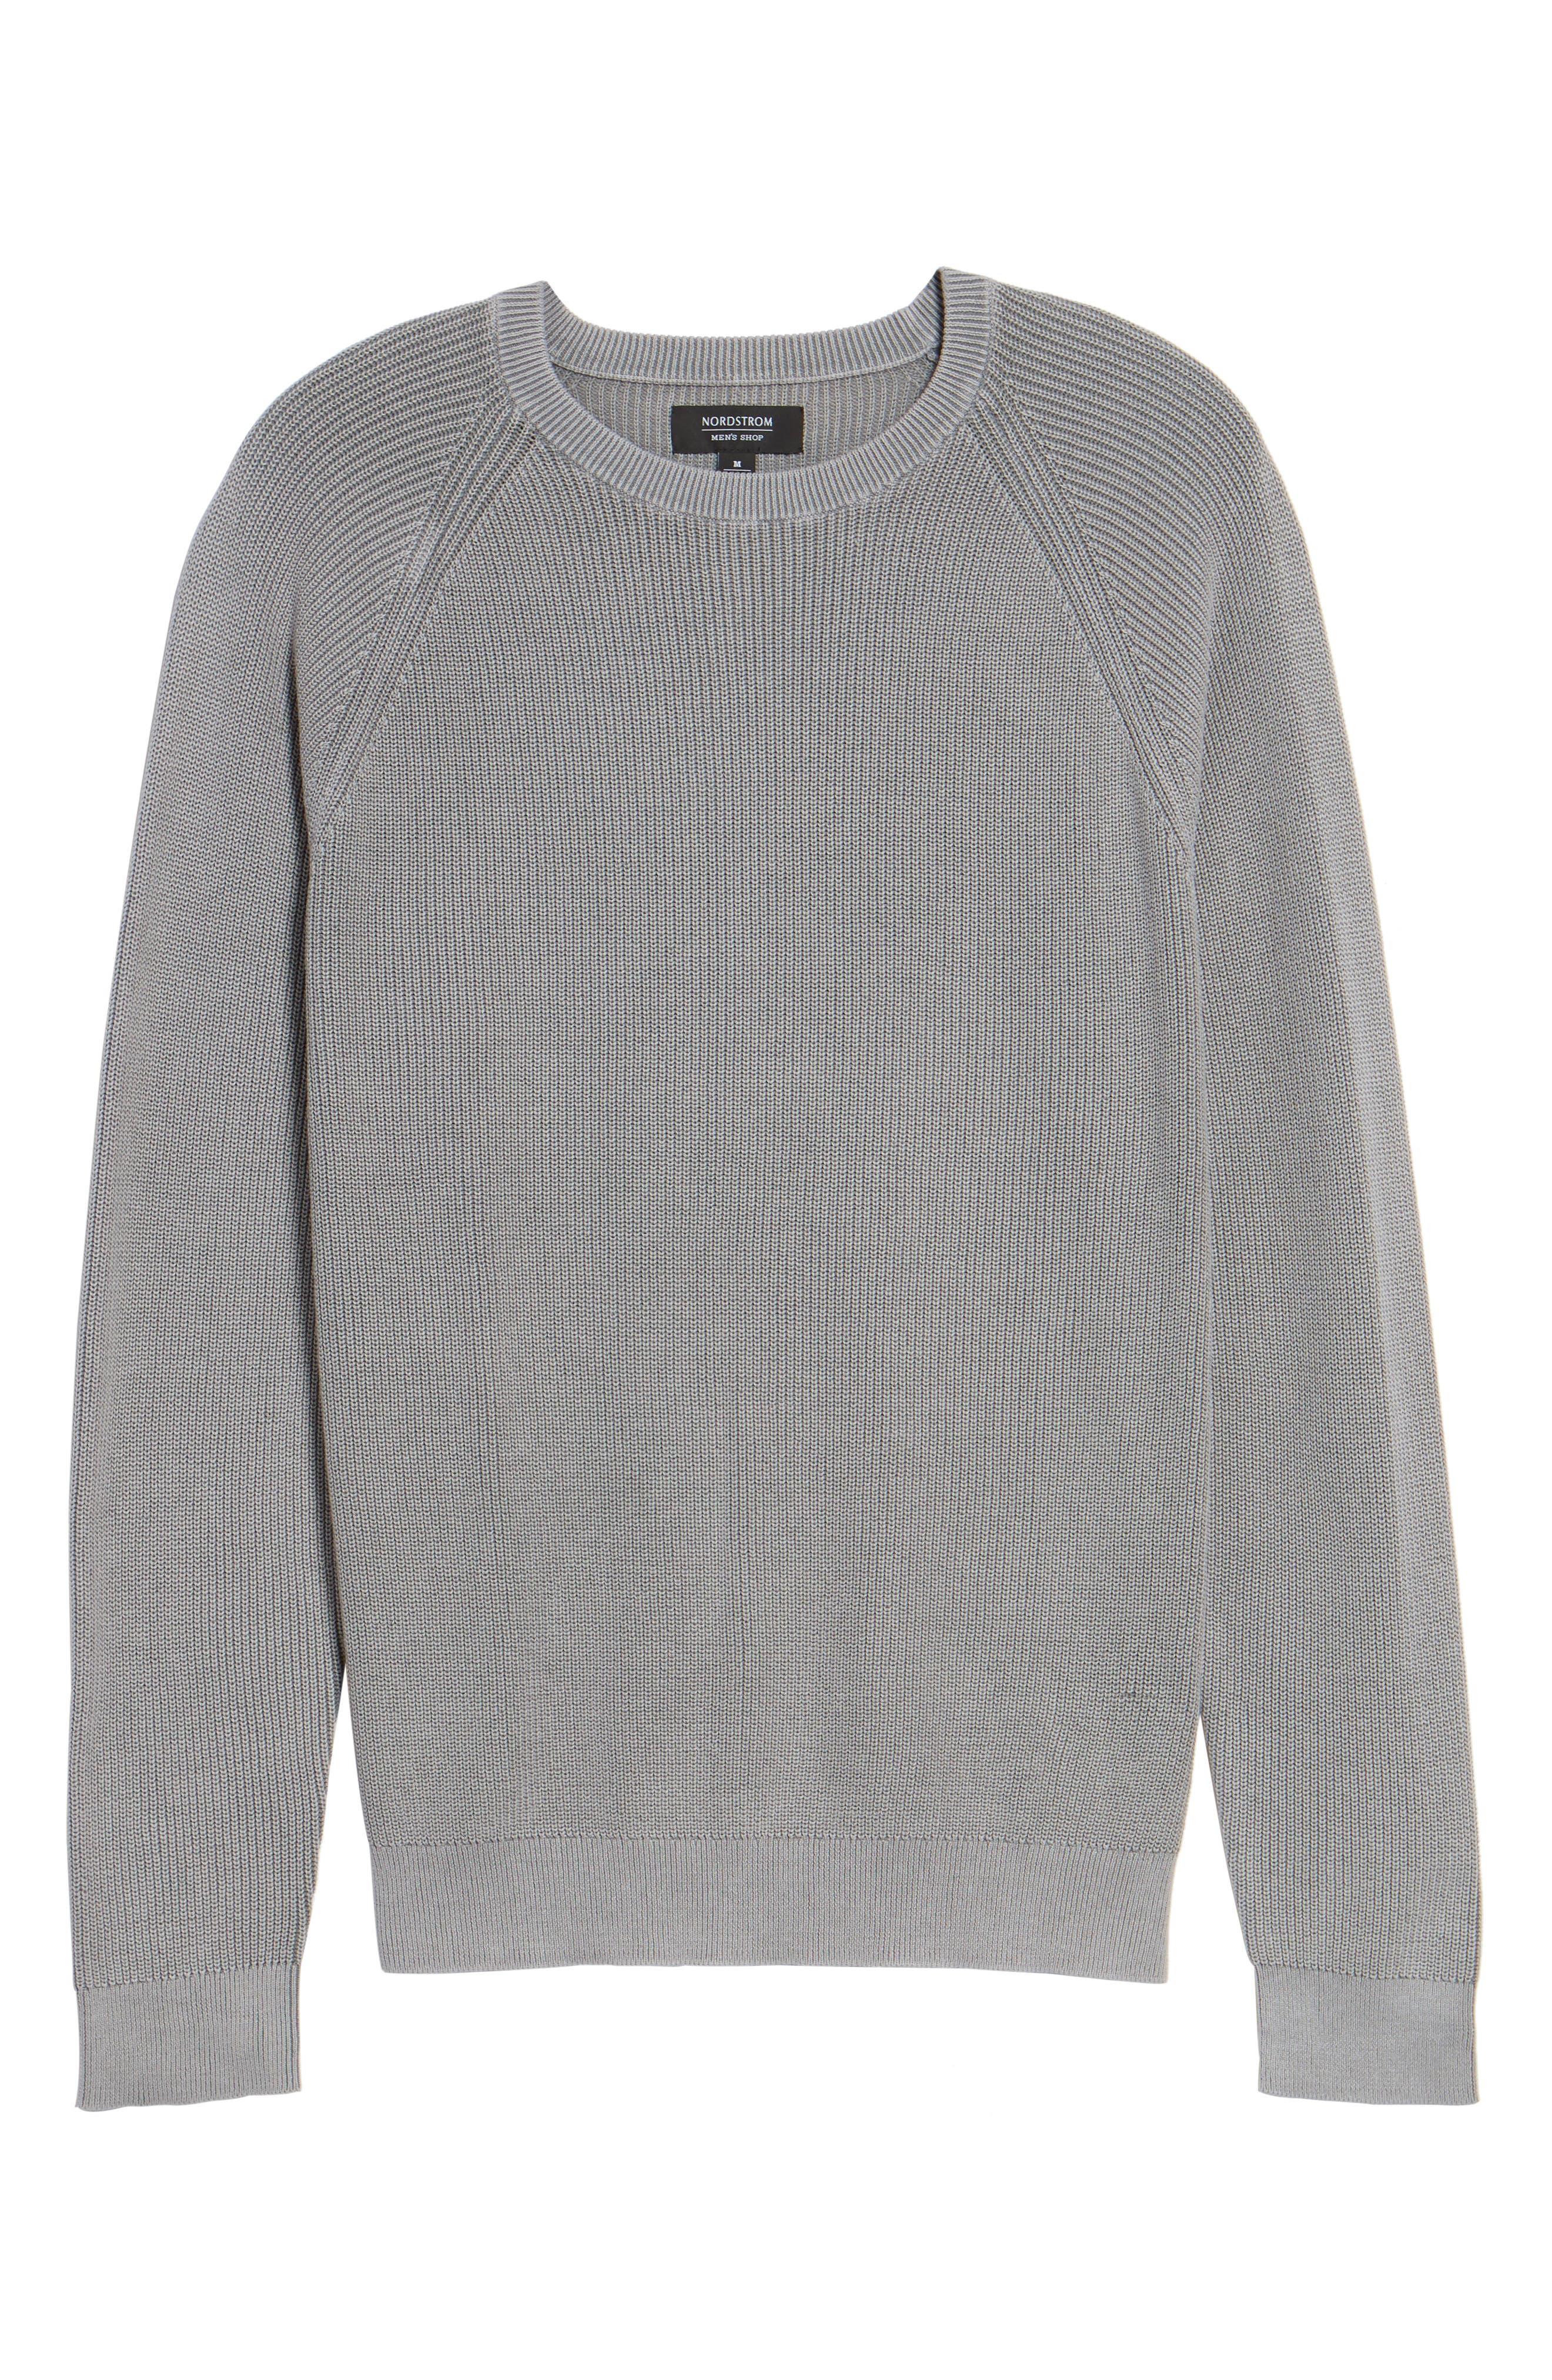 Crewneck Sweater,                             Alternate thumbnail 7, color,                             Grey Weather